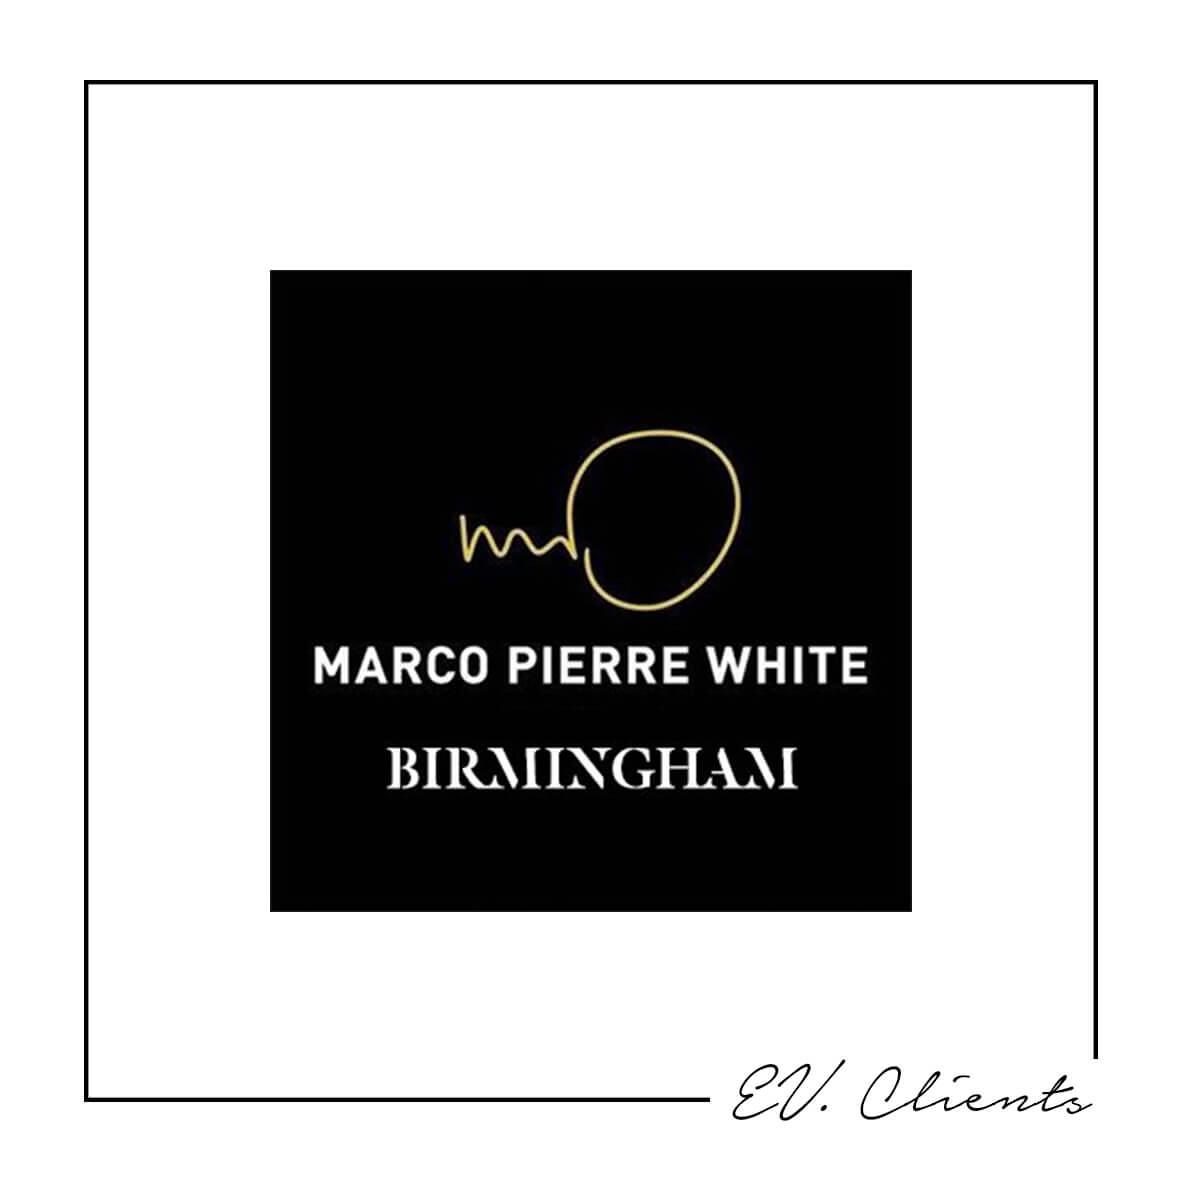 Marco Pierre White Birmingham